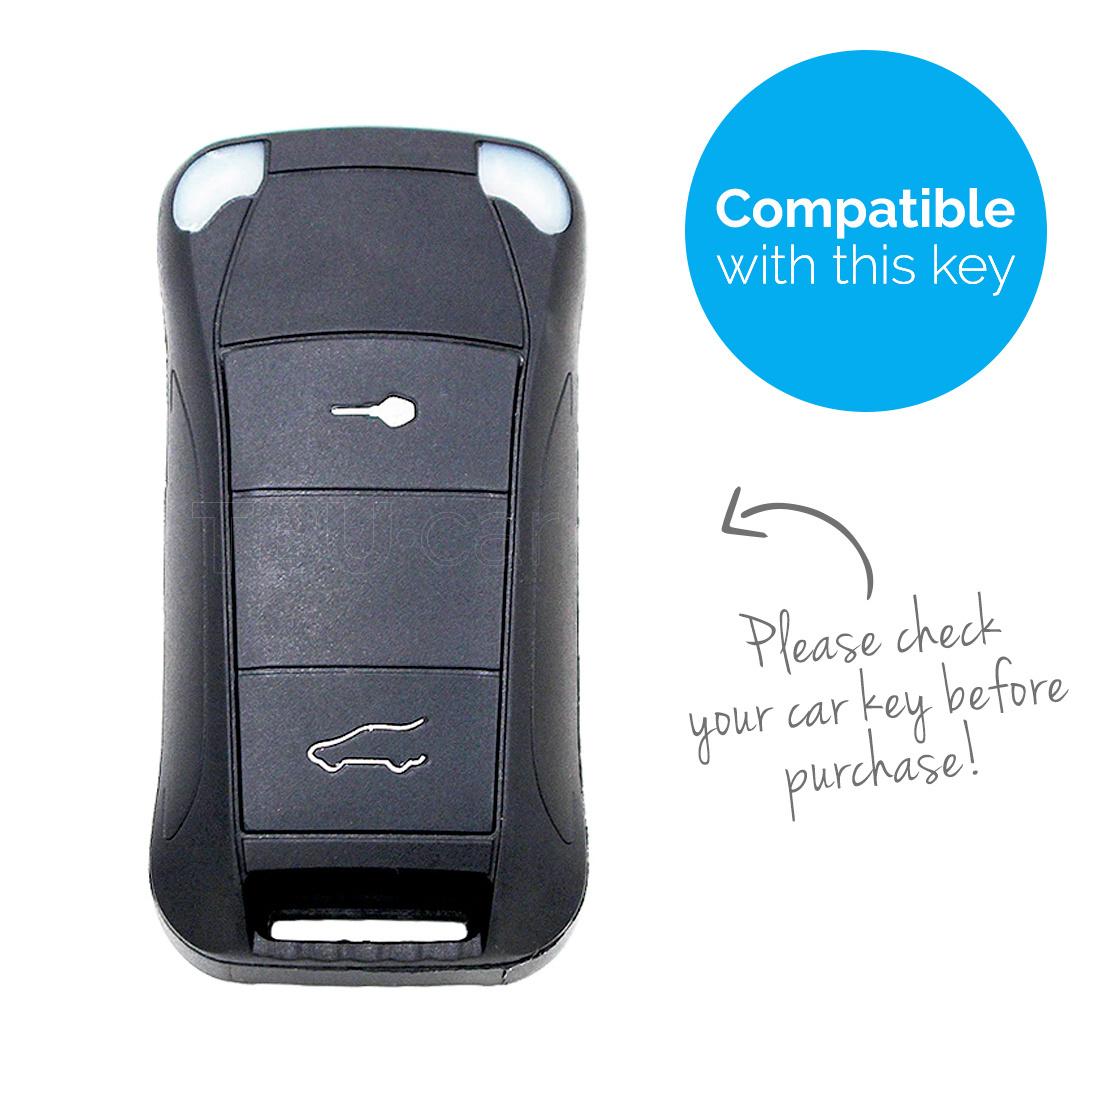 TBU car TBU car Sleutel cover compatibel met Porsche - Silicone sleutelhoesje - beschermhoesje autosleutel - Lichtblauw